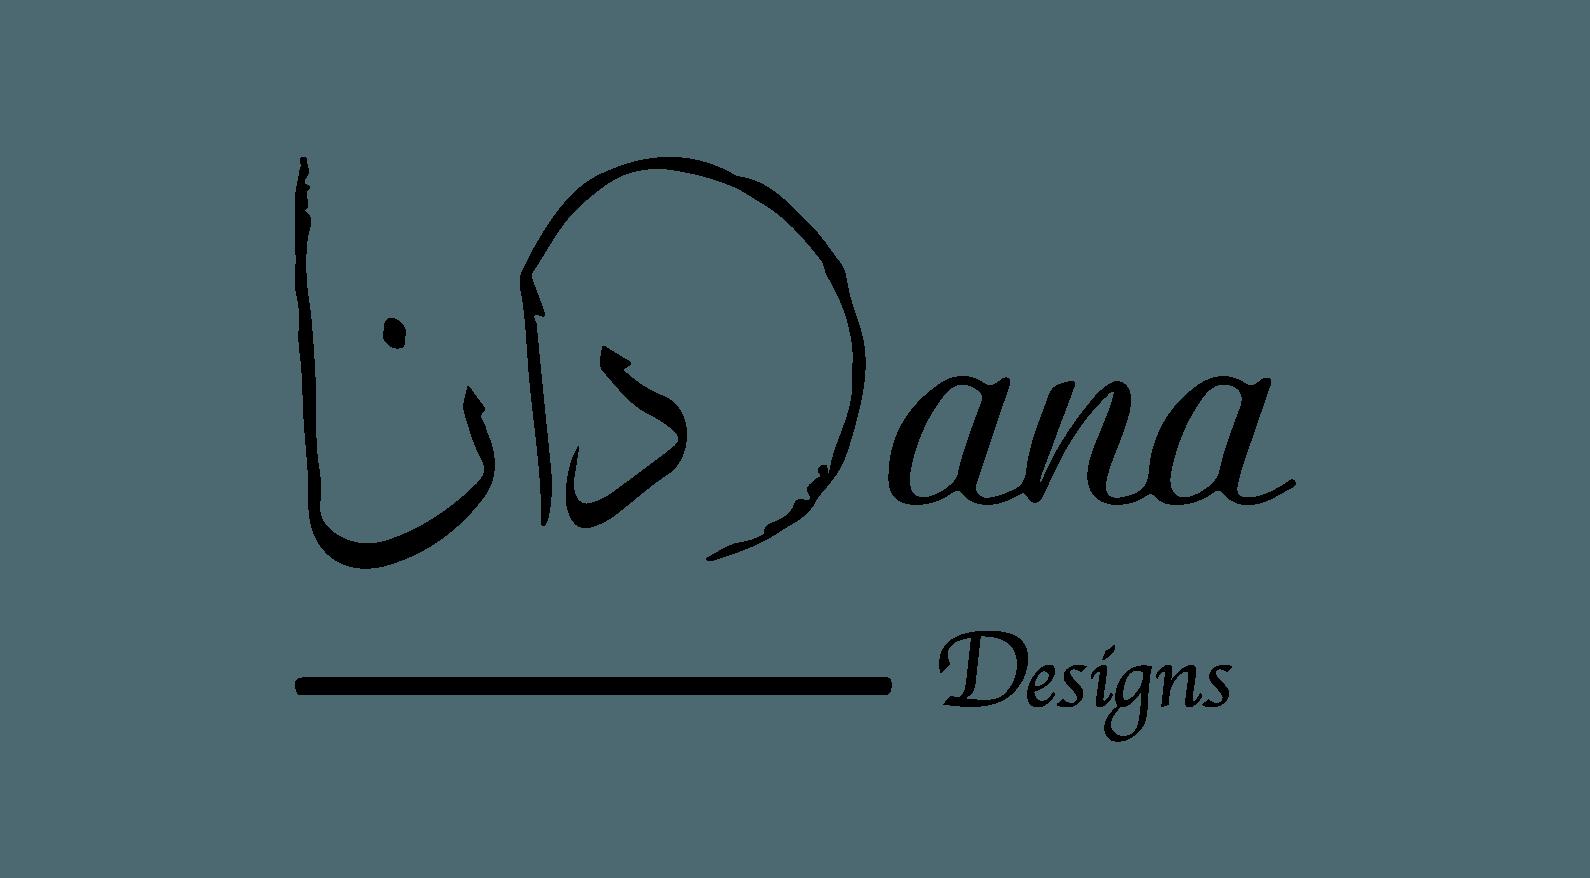 Dana.designs